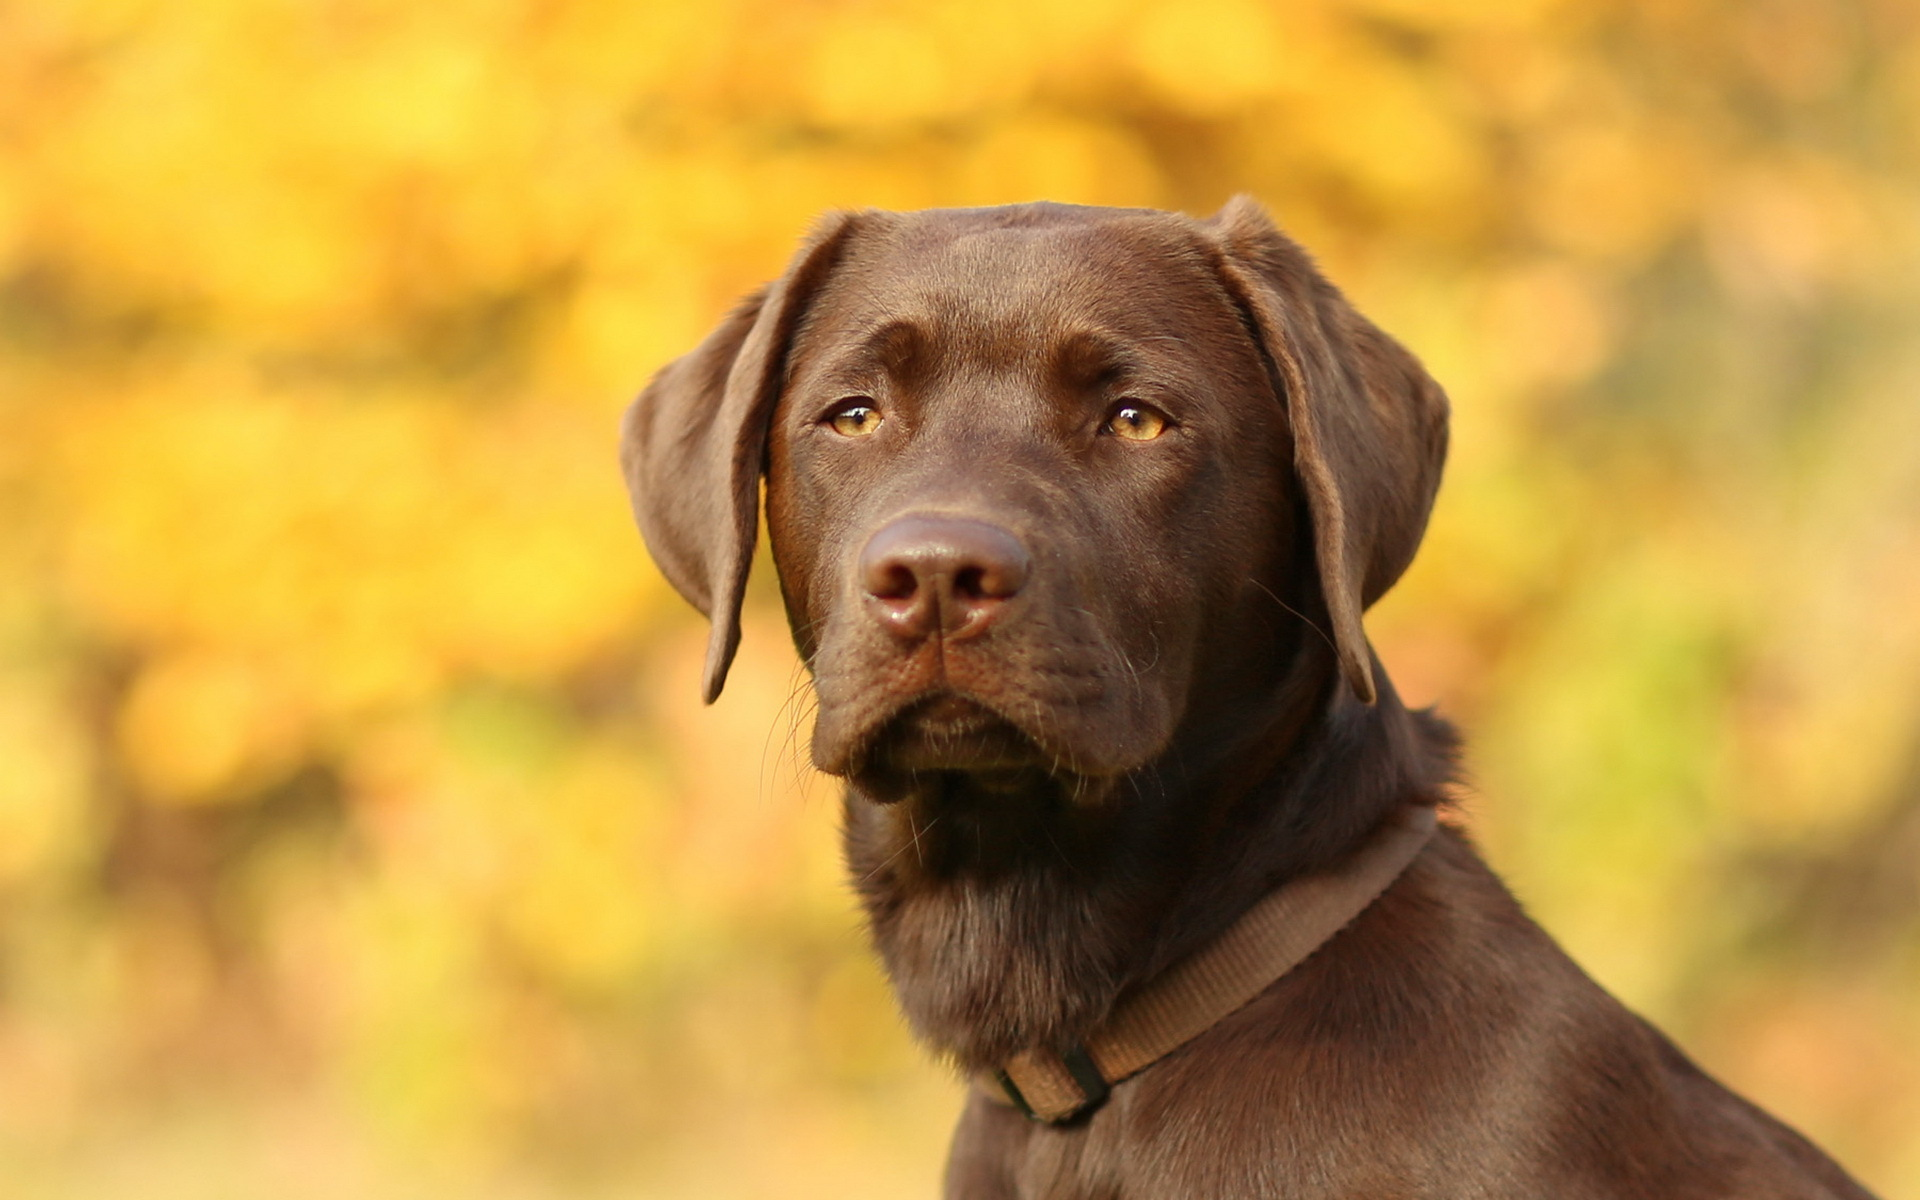 fav 0 rate 0 tweet 1920x1200 animals dog labrador retriever resolution 1920x1200